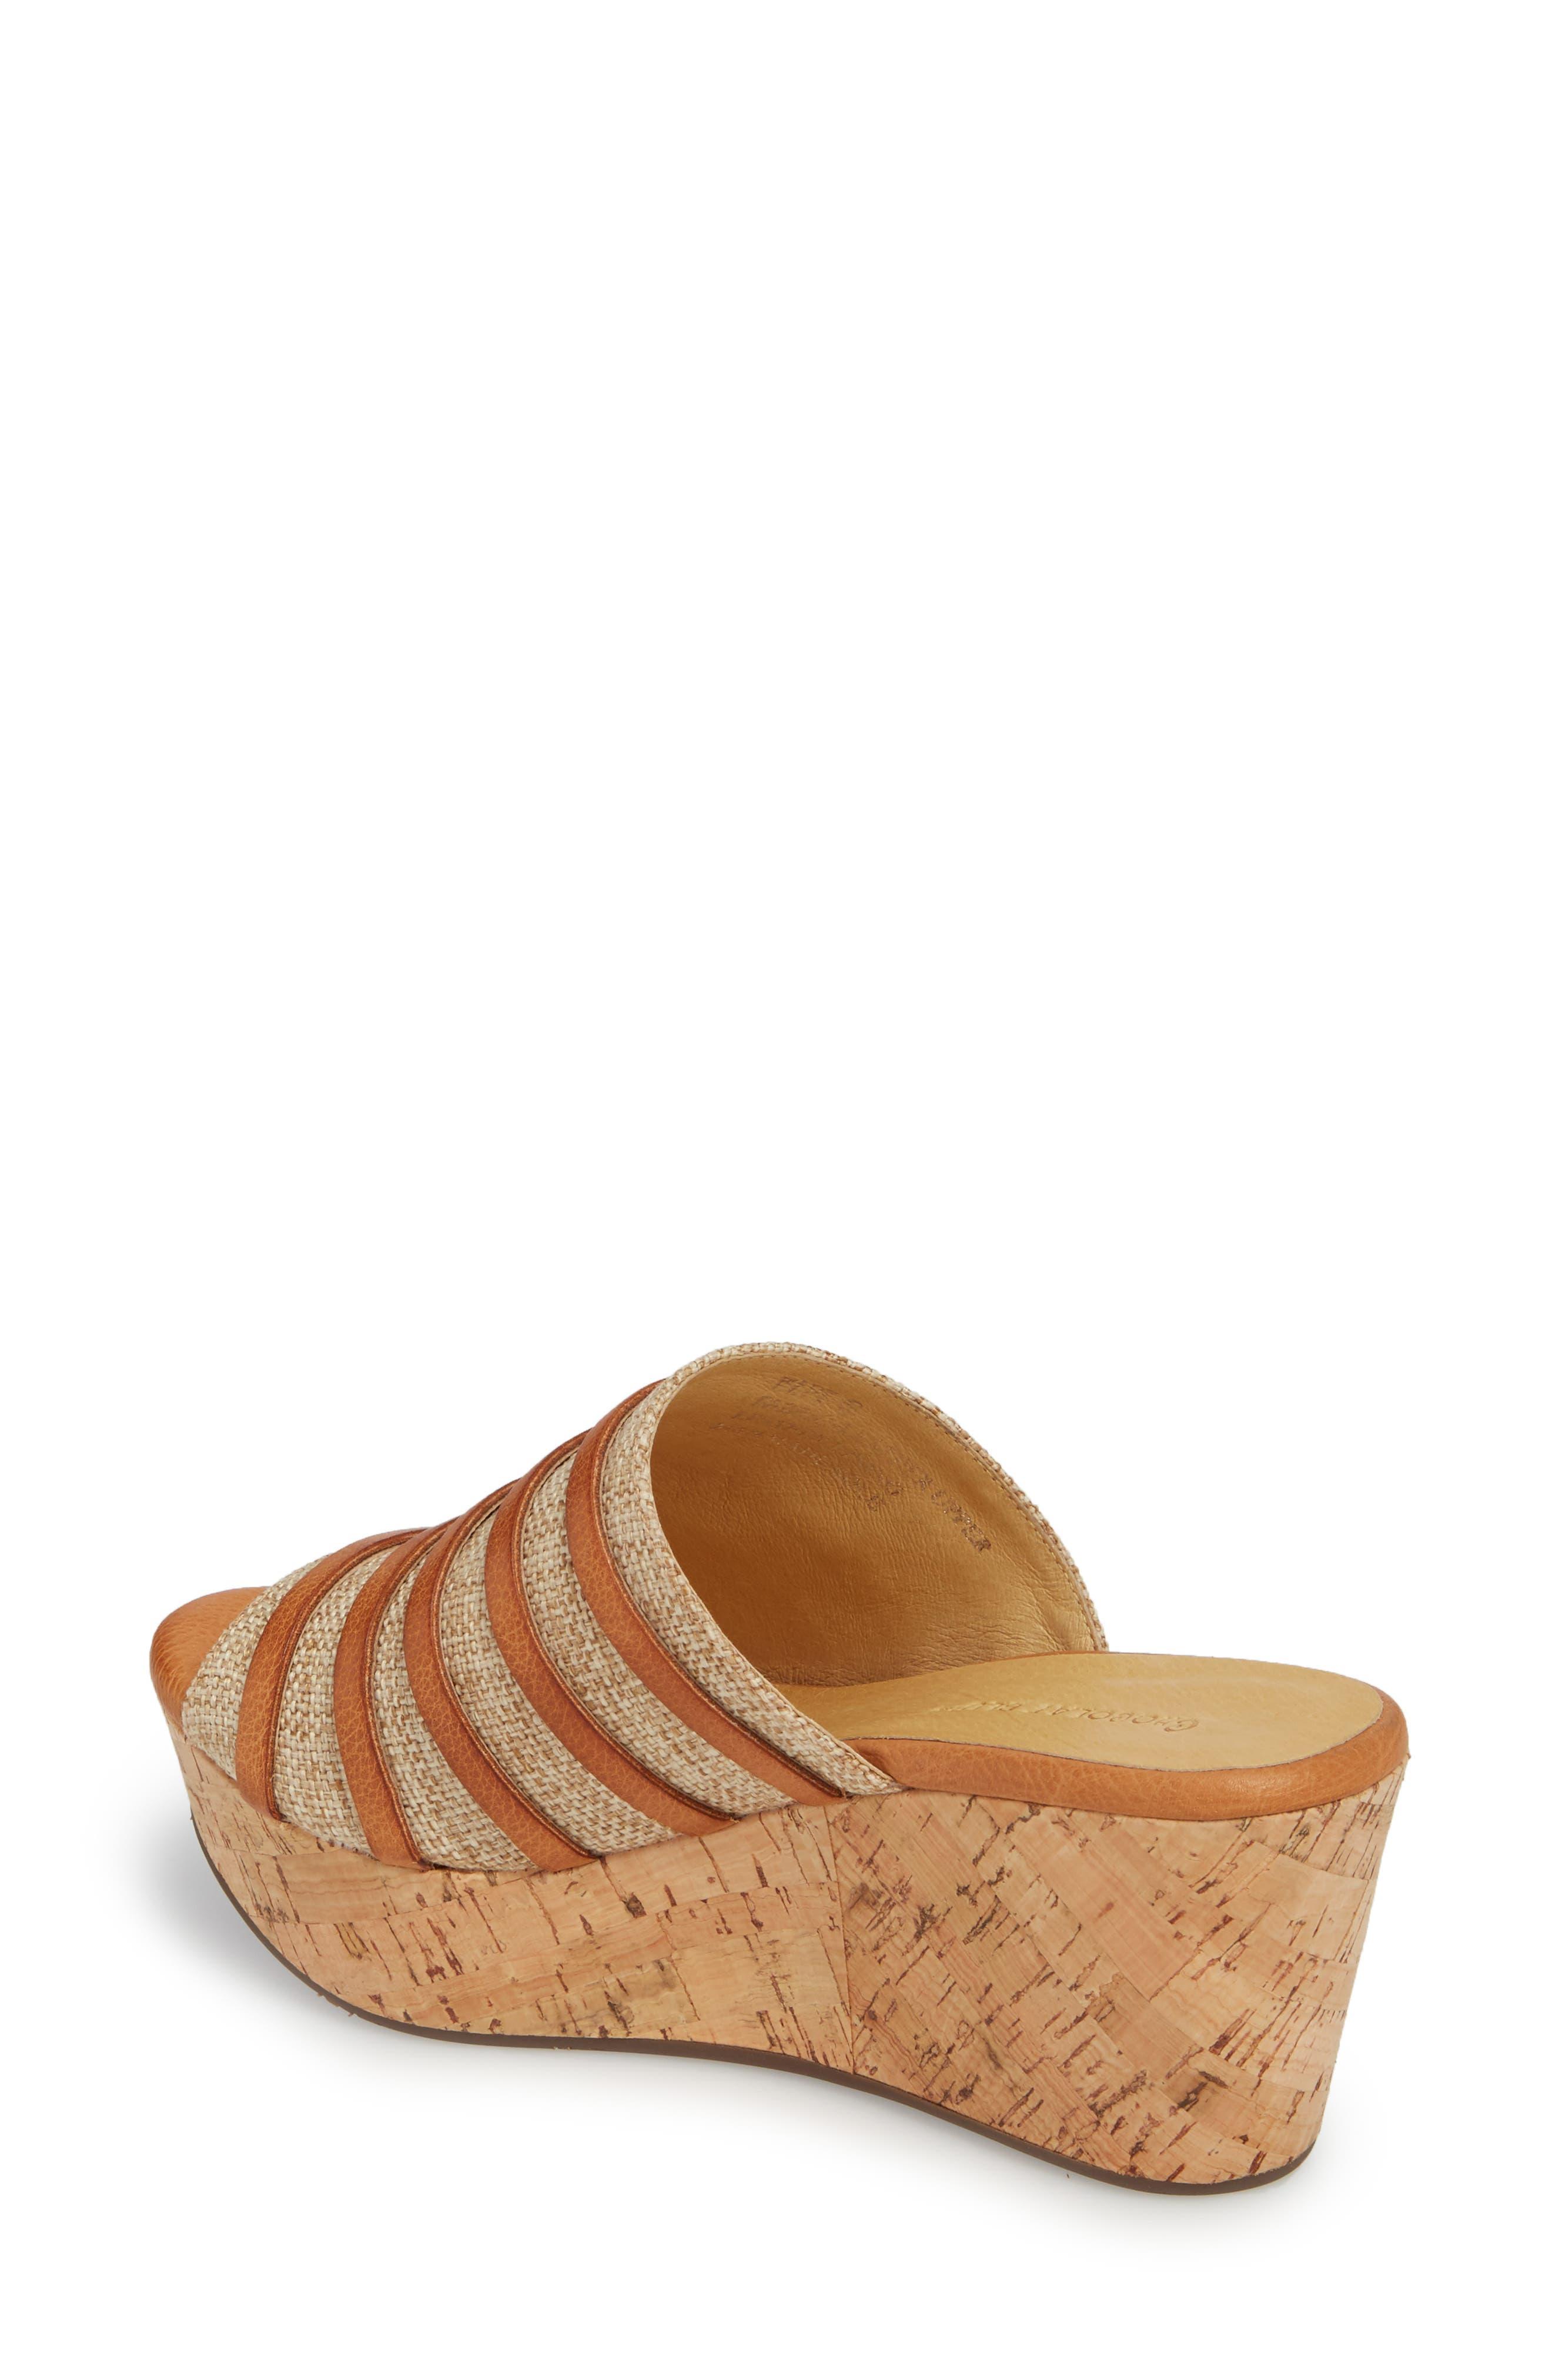 Wapi Wedge Sandal,                             Alternate thumbnail 2, color,